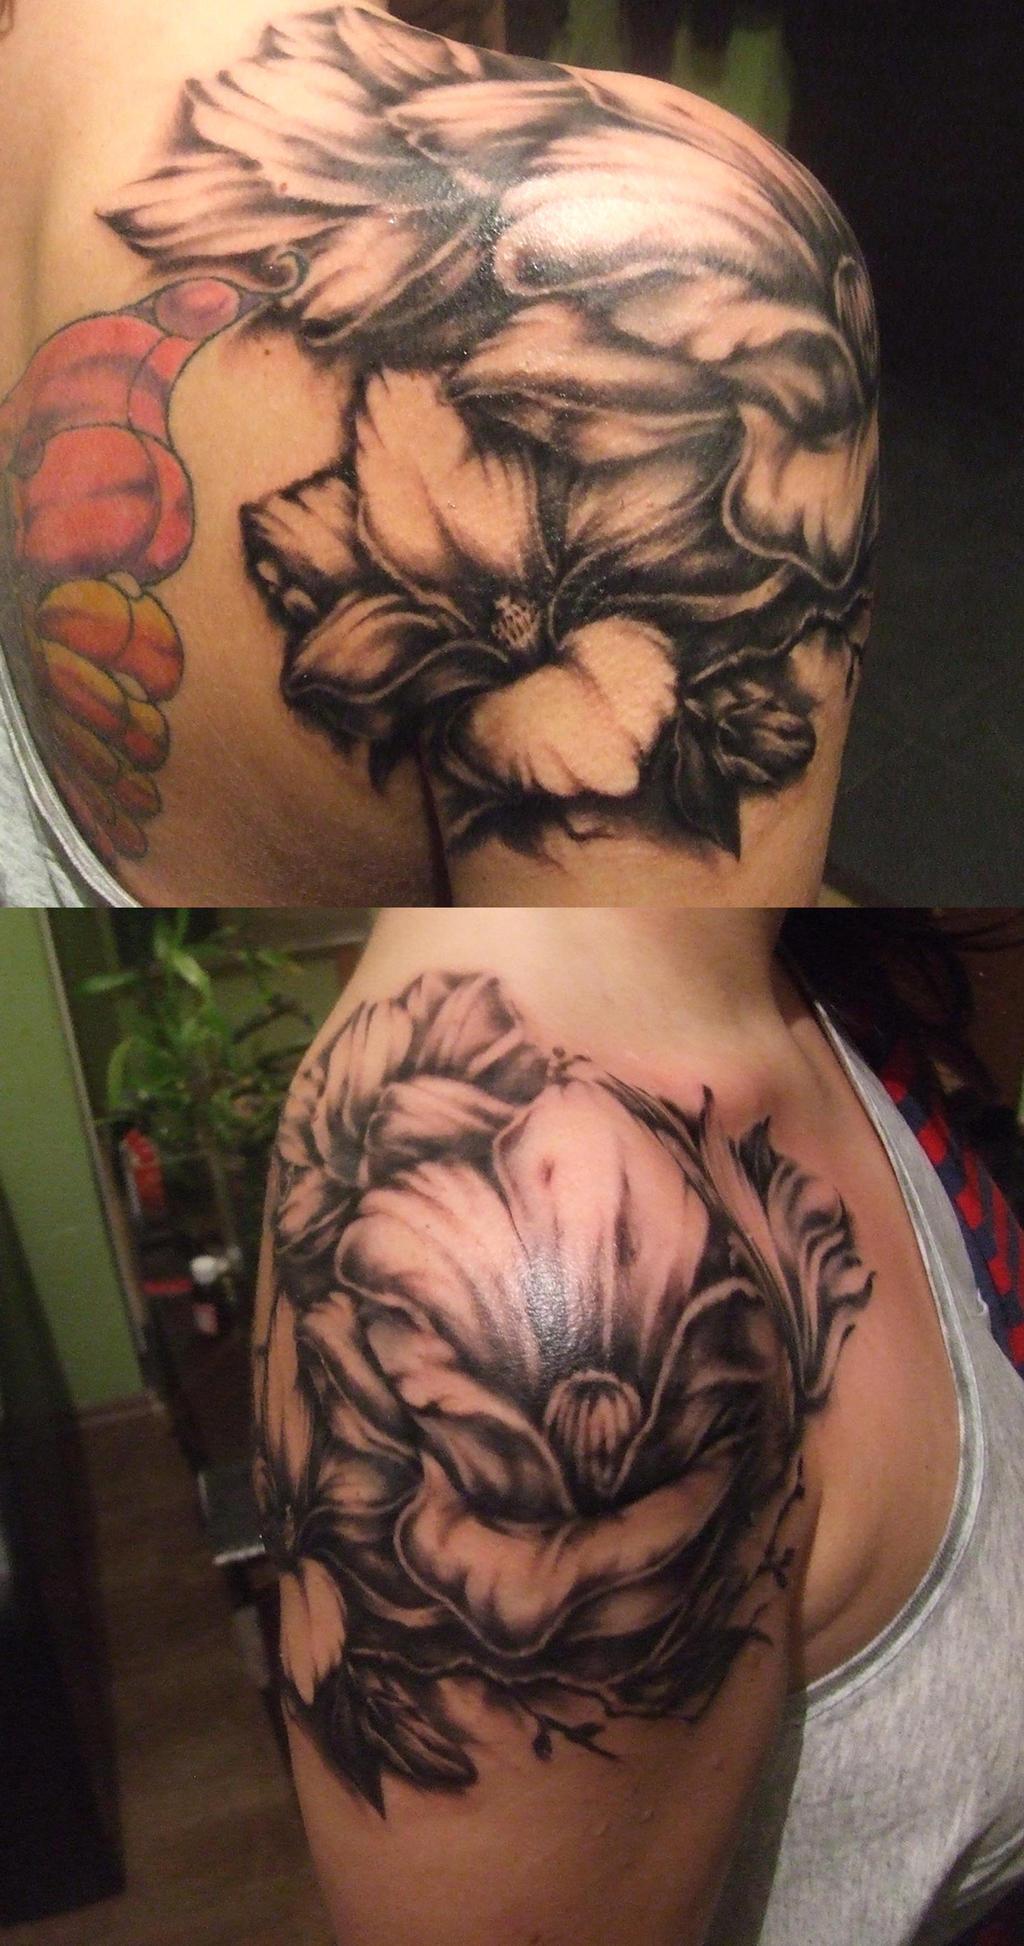 flowers tattoo by zioman on DeviantArt